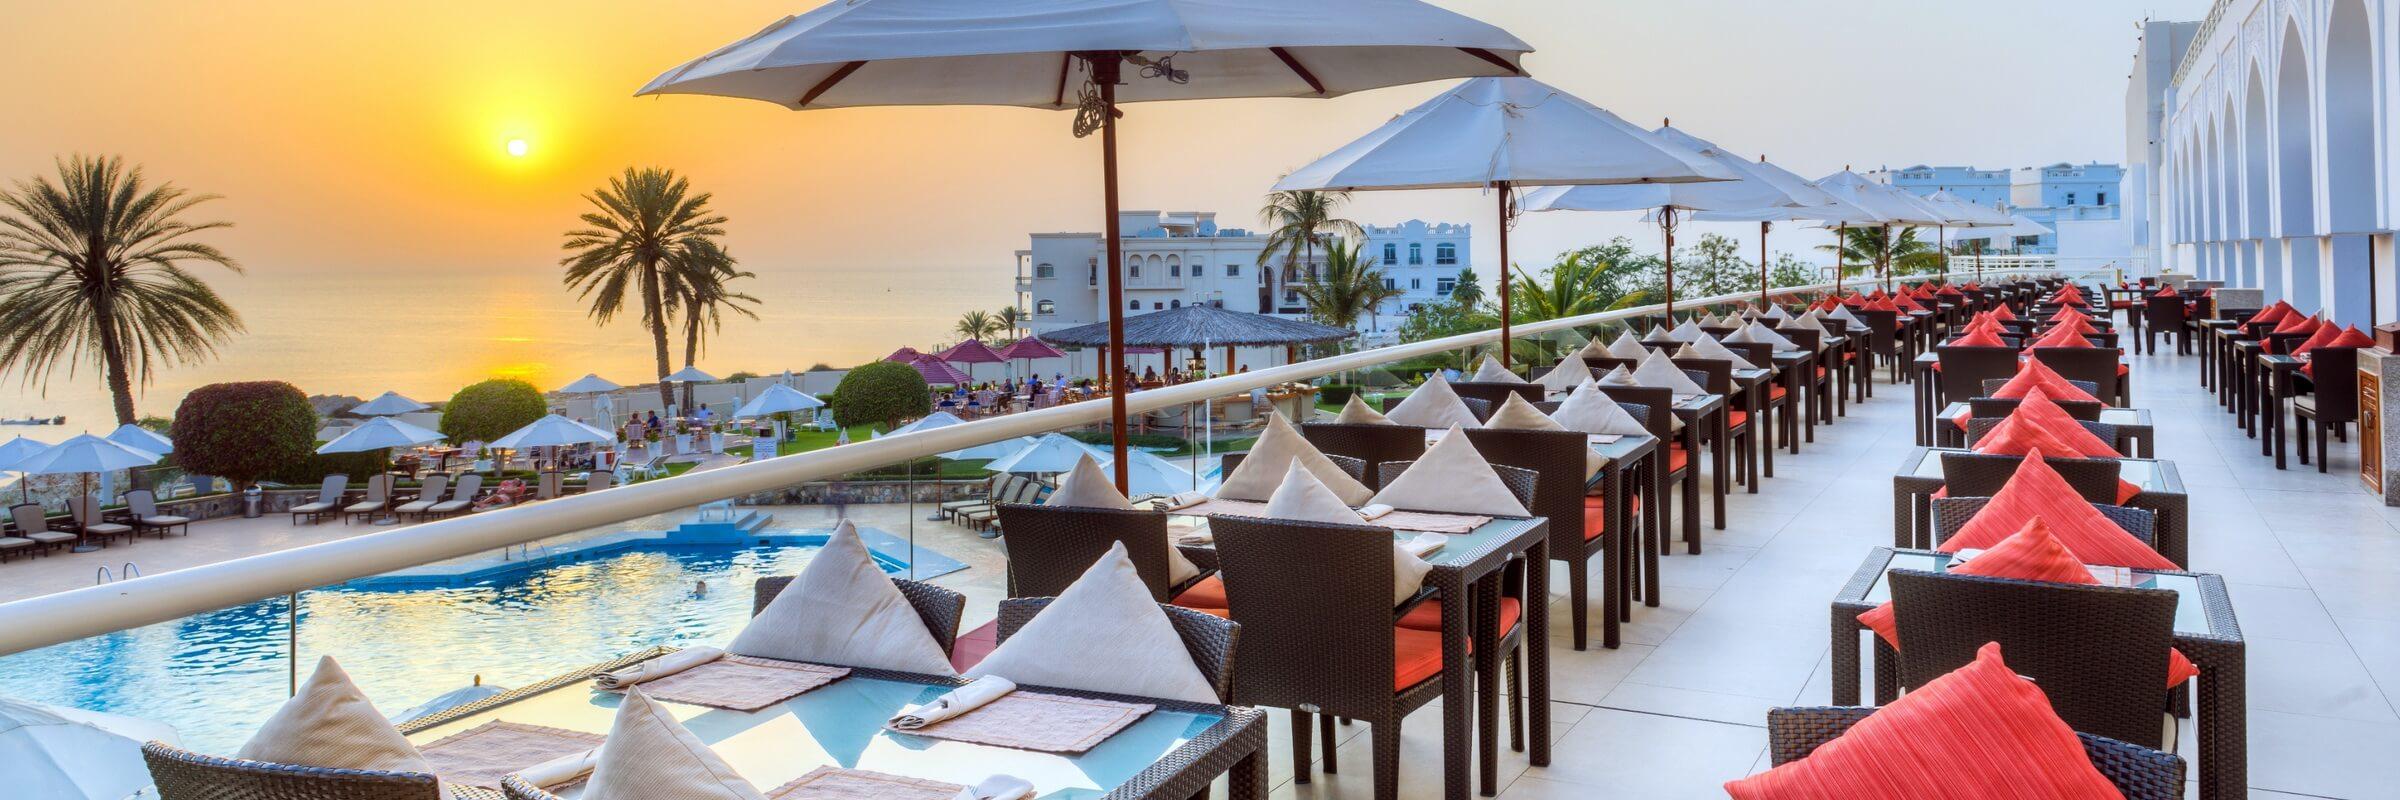 Die einladende Terrasse des Crowne Plaz Hotel mit atemberaubendem Meerblick im Crowne Plaza Hotel